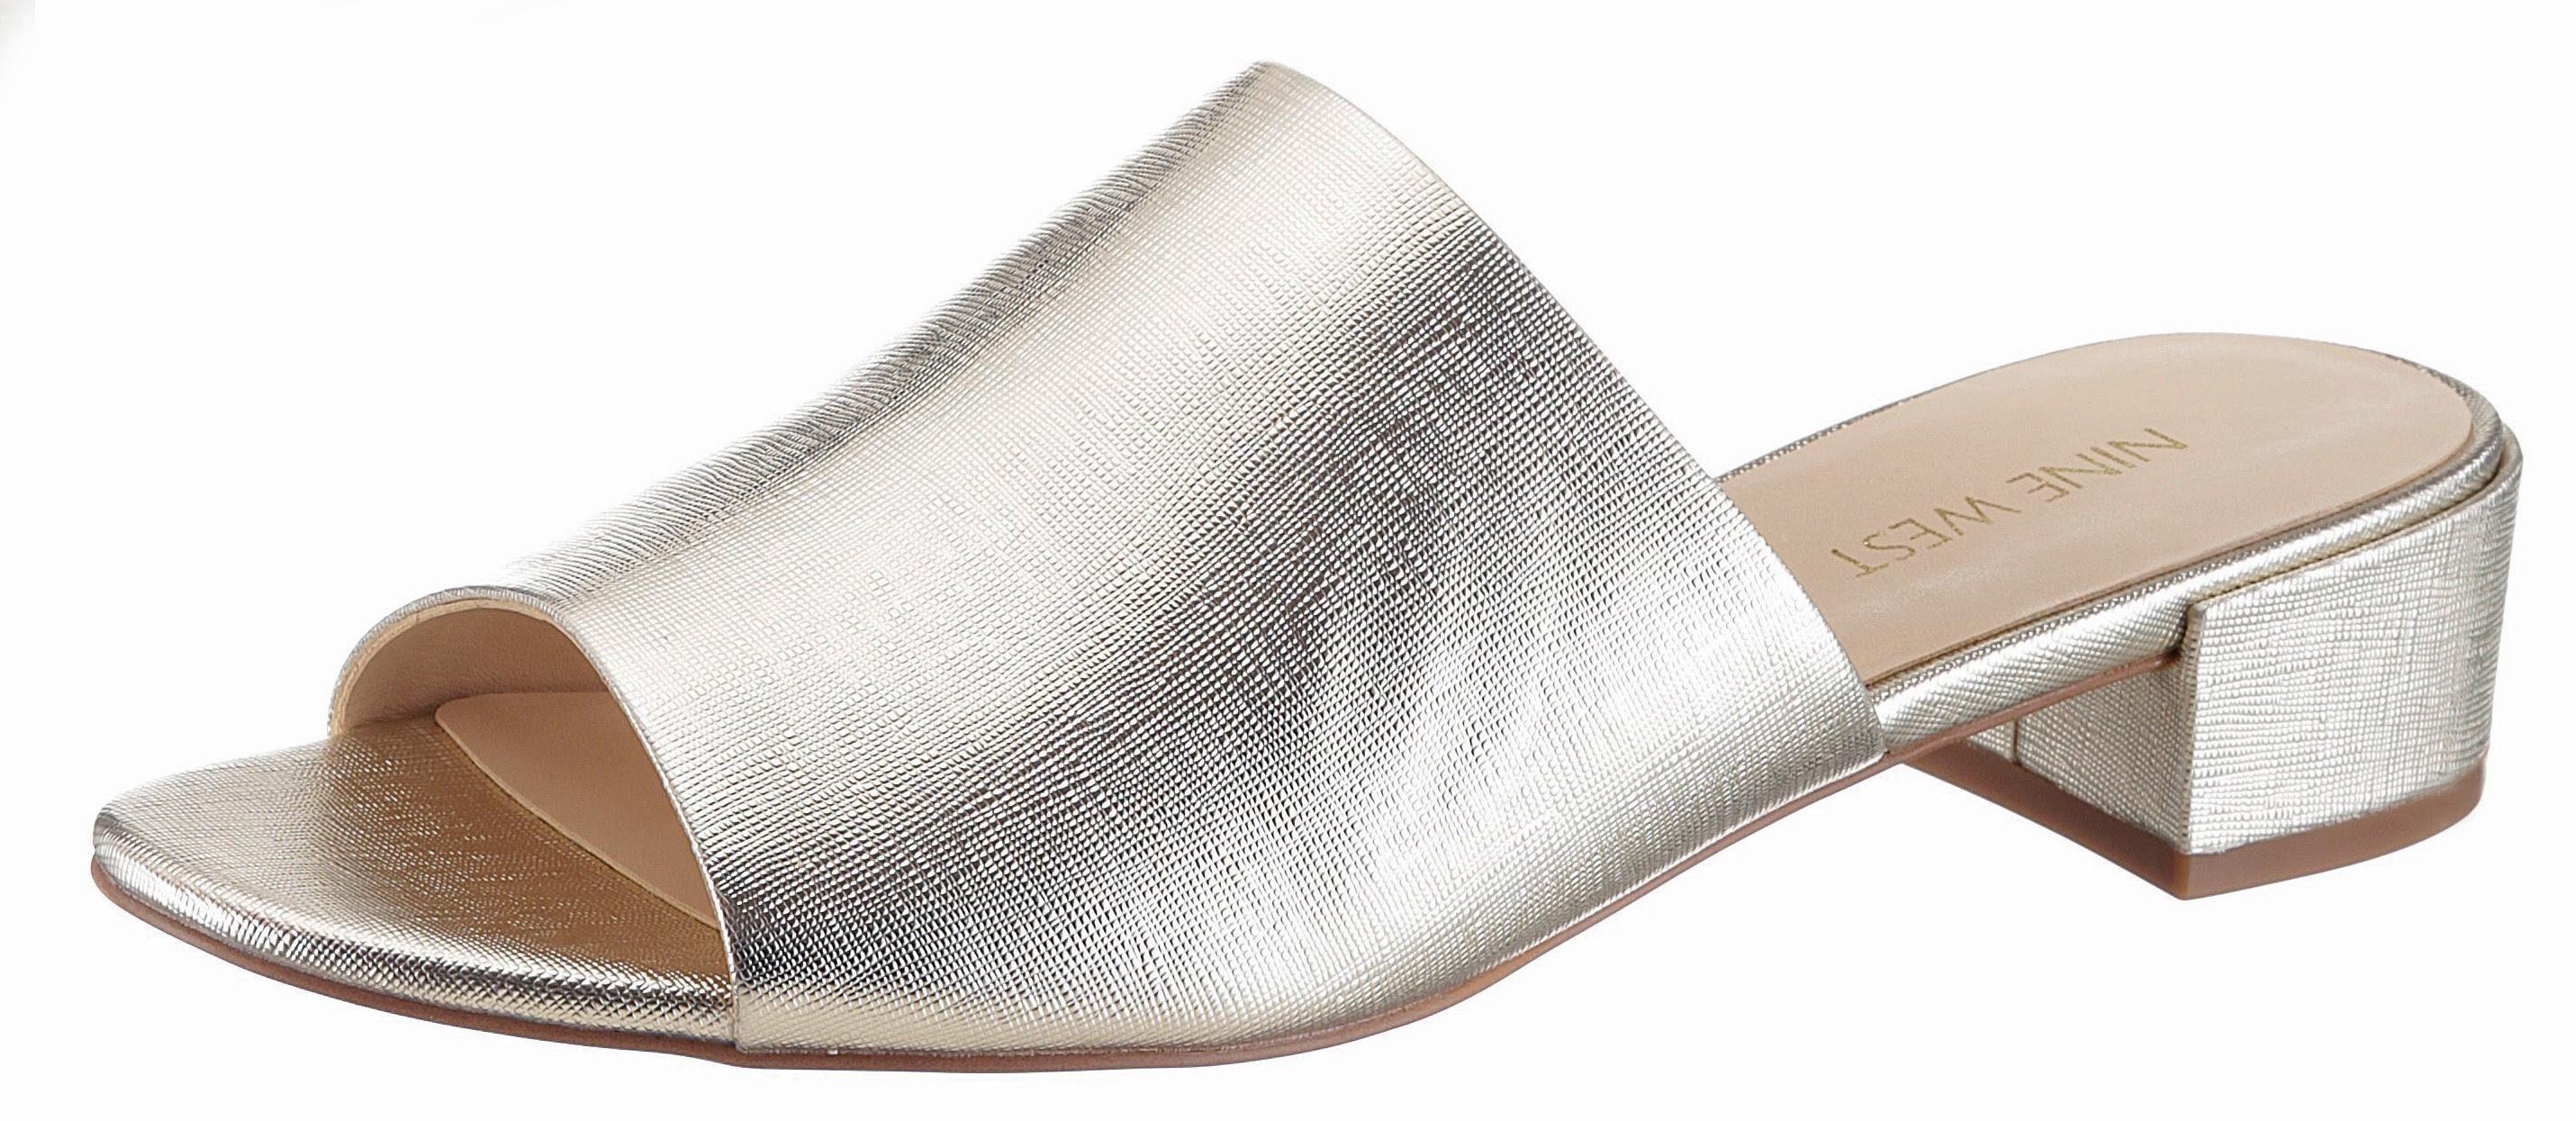 Nine West Raissa3 Pantolette, im trendigen Metallic-Look online kaufen  goldfarben